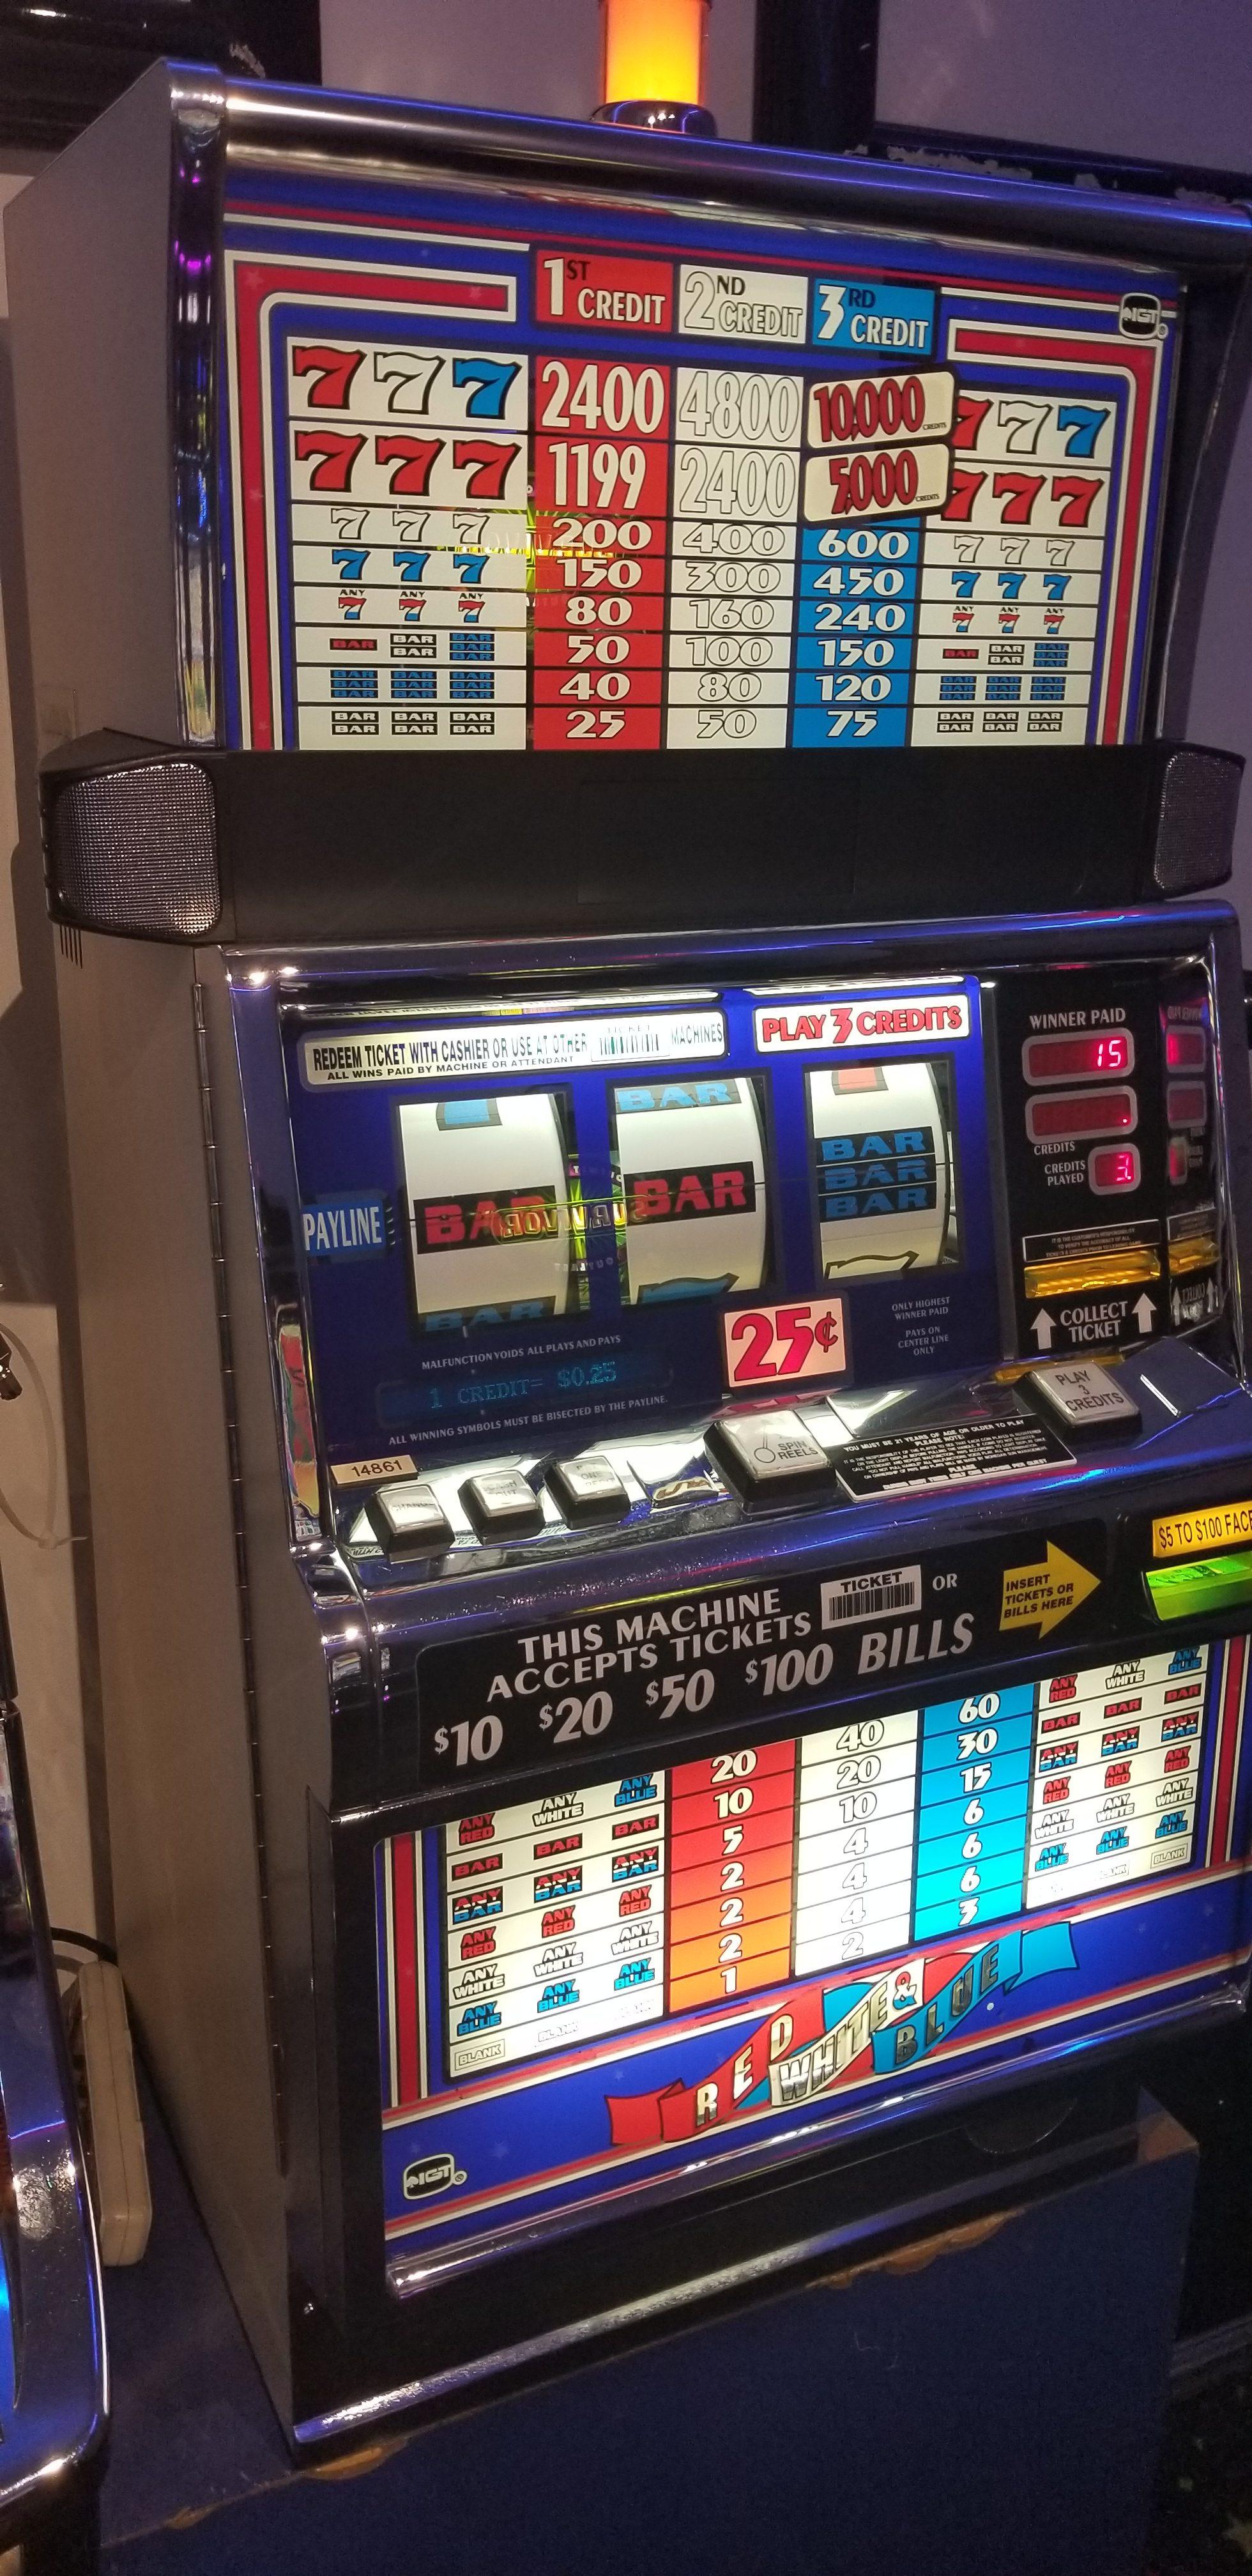 IGT S2000 Red White & Blue Slot Machine - Slot Machines